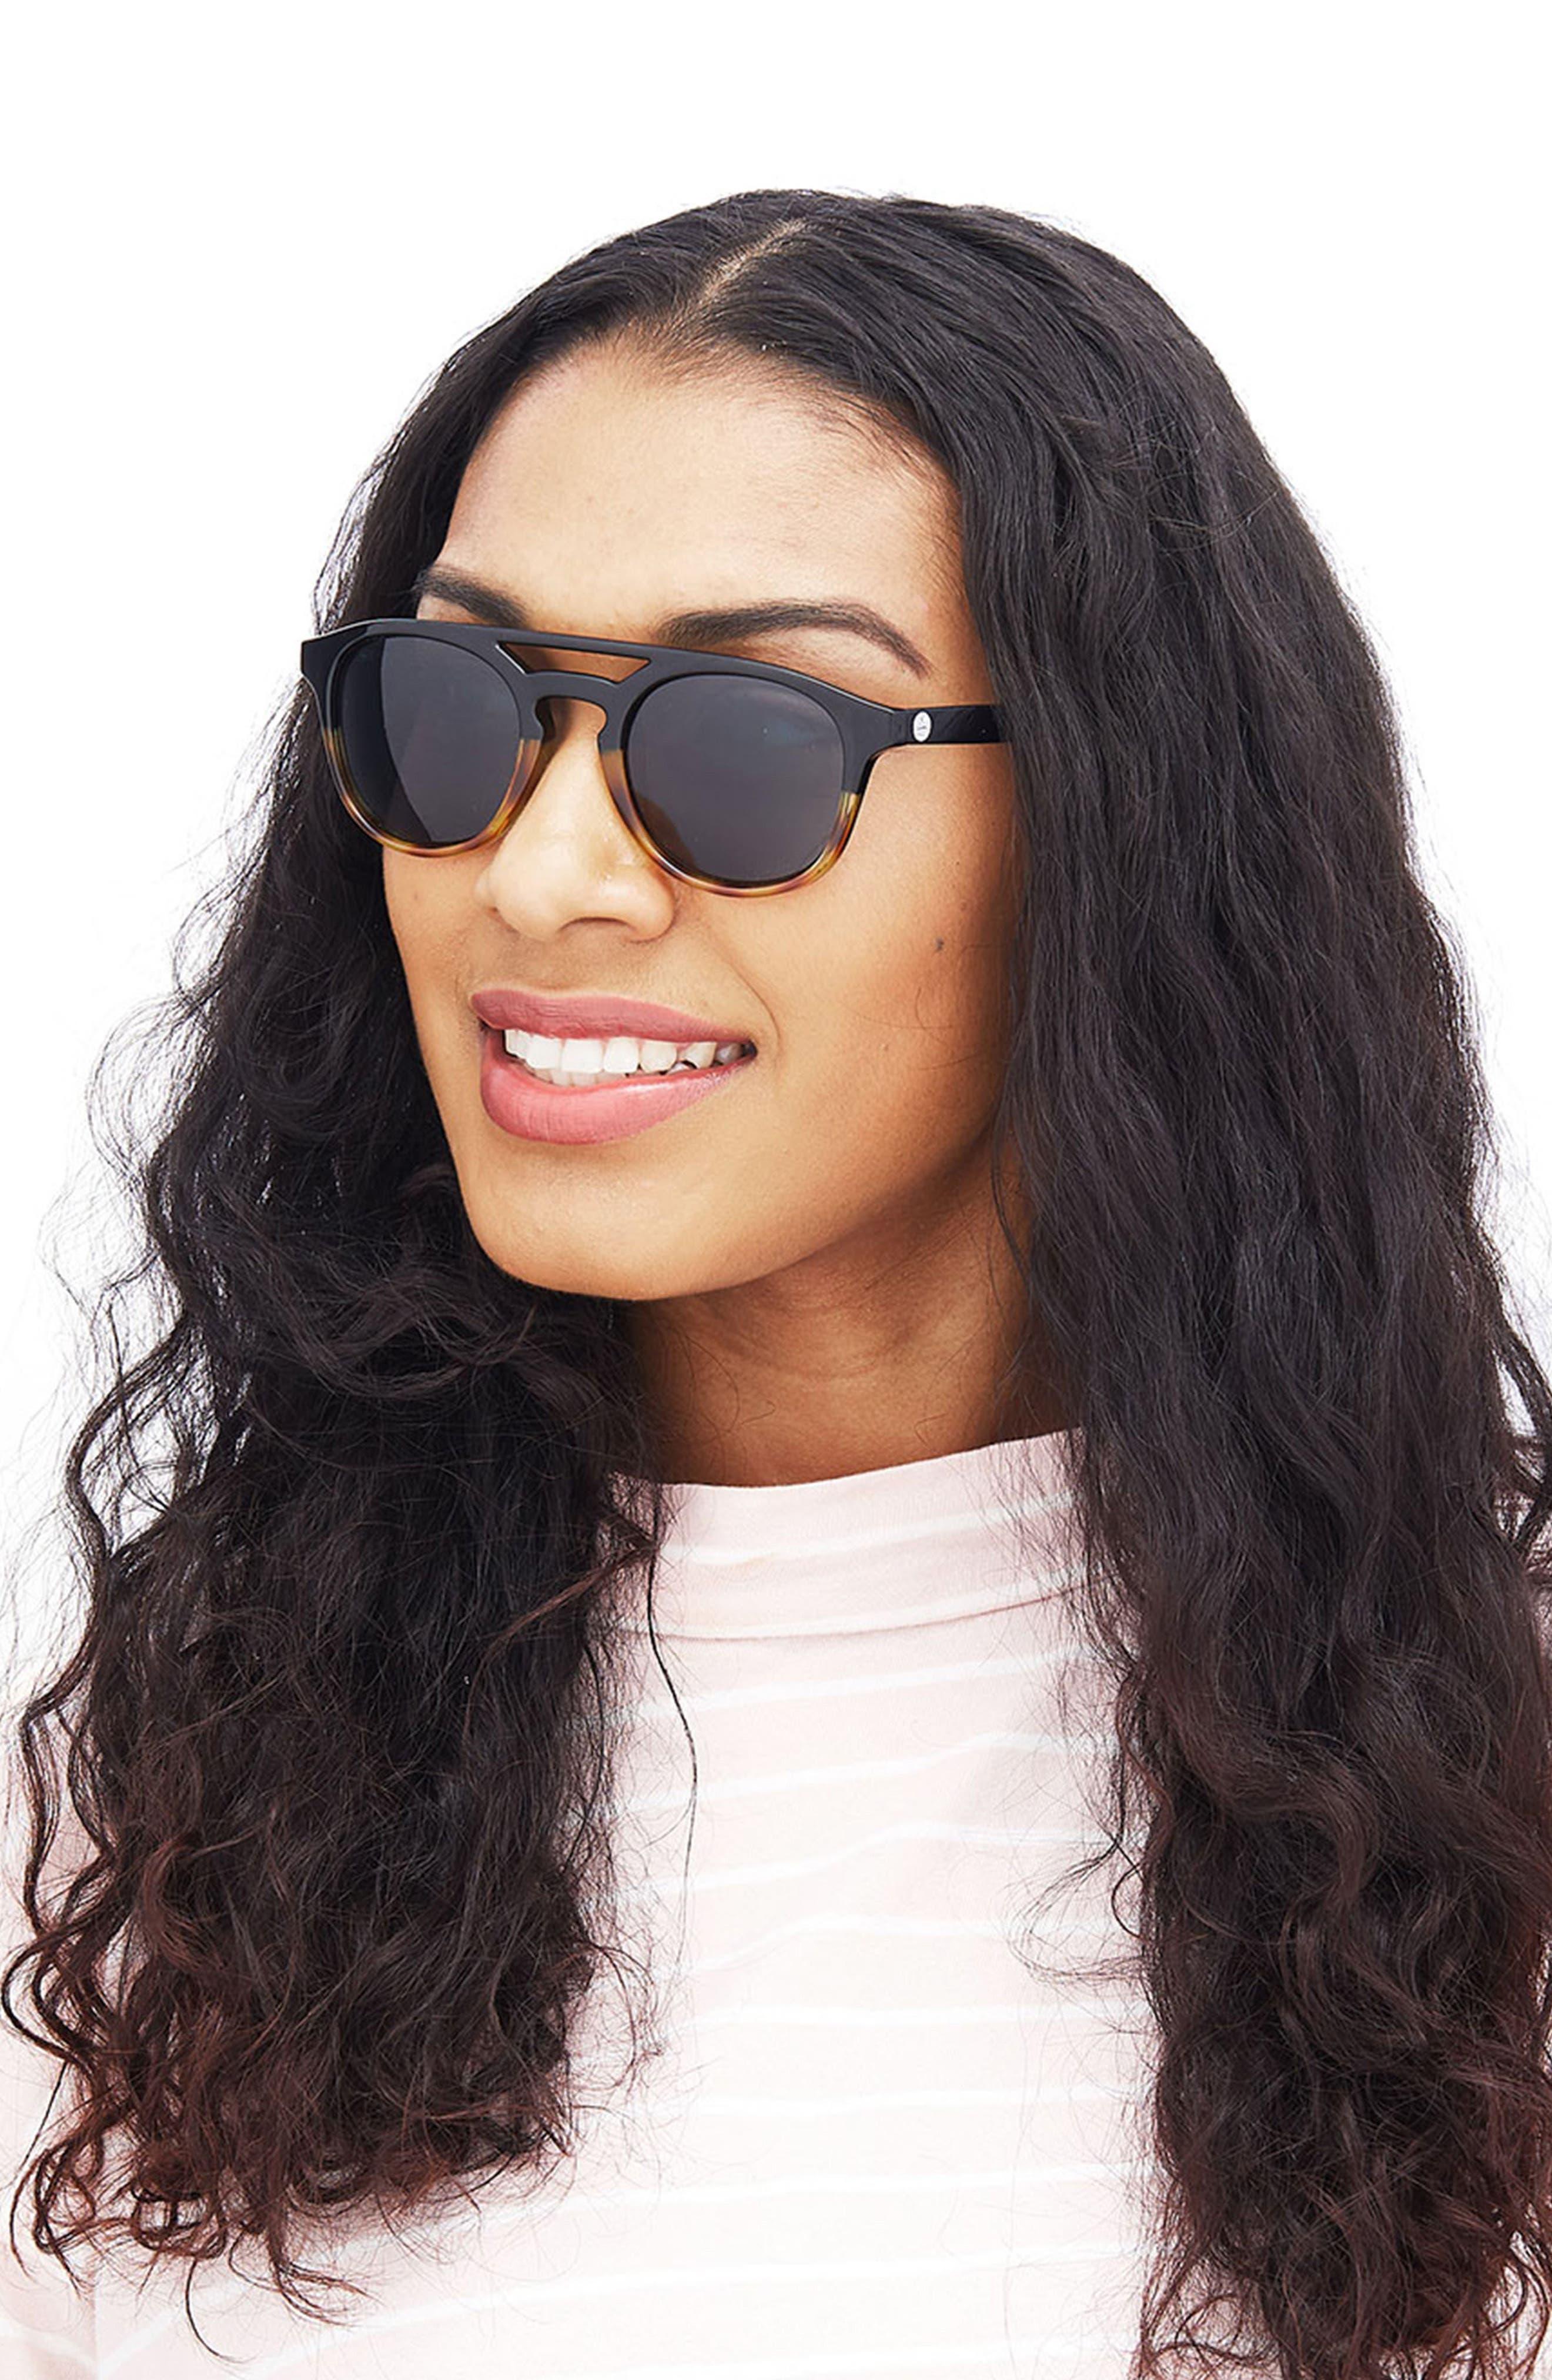 Olema 53mm Polarized Sunglasses,                             Alternate thumbnail 5, color,                             TORTOISE AMBER